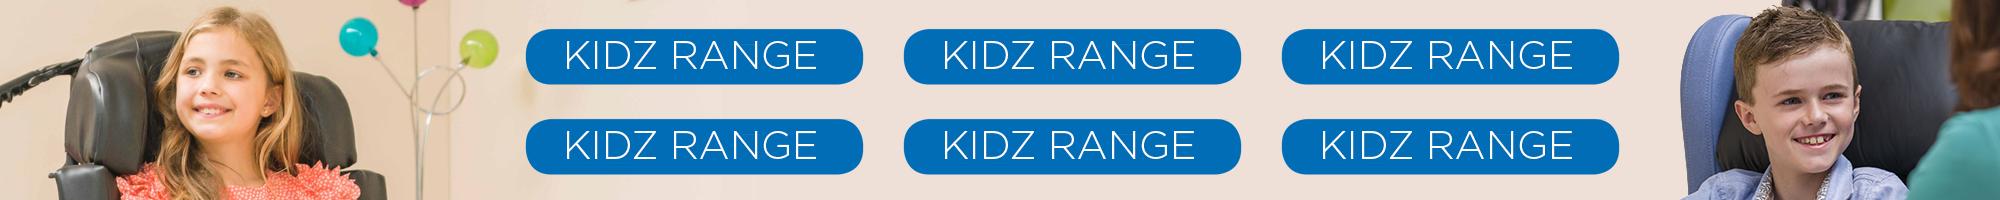 Kidz Guide lp header.png